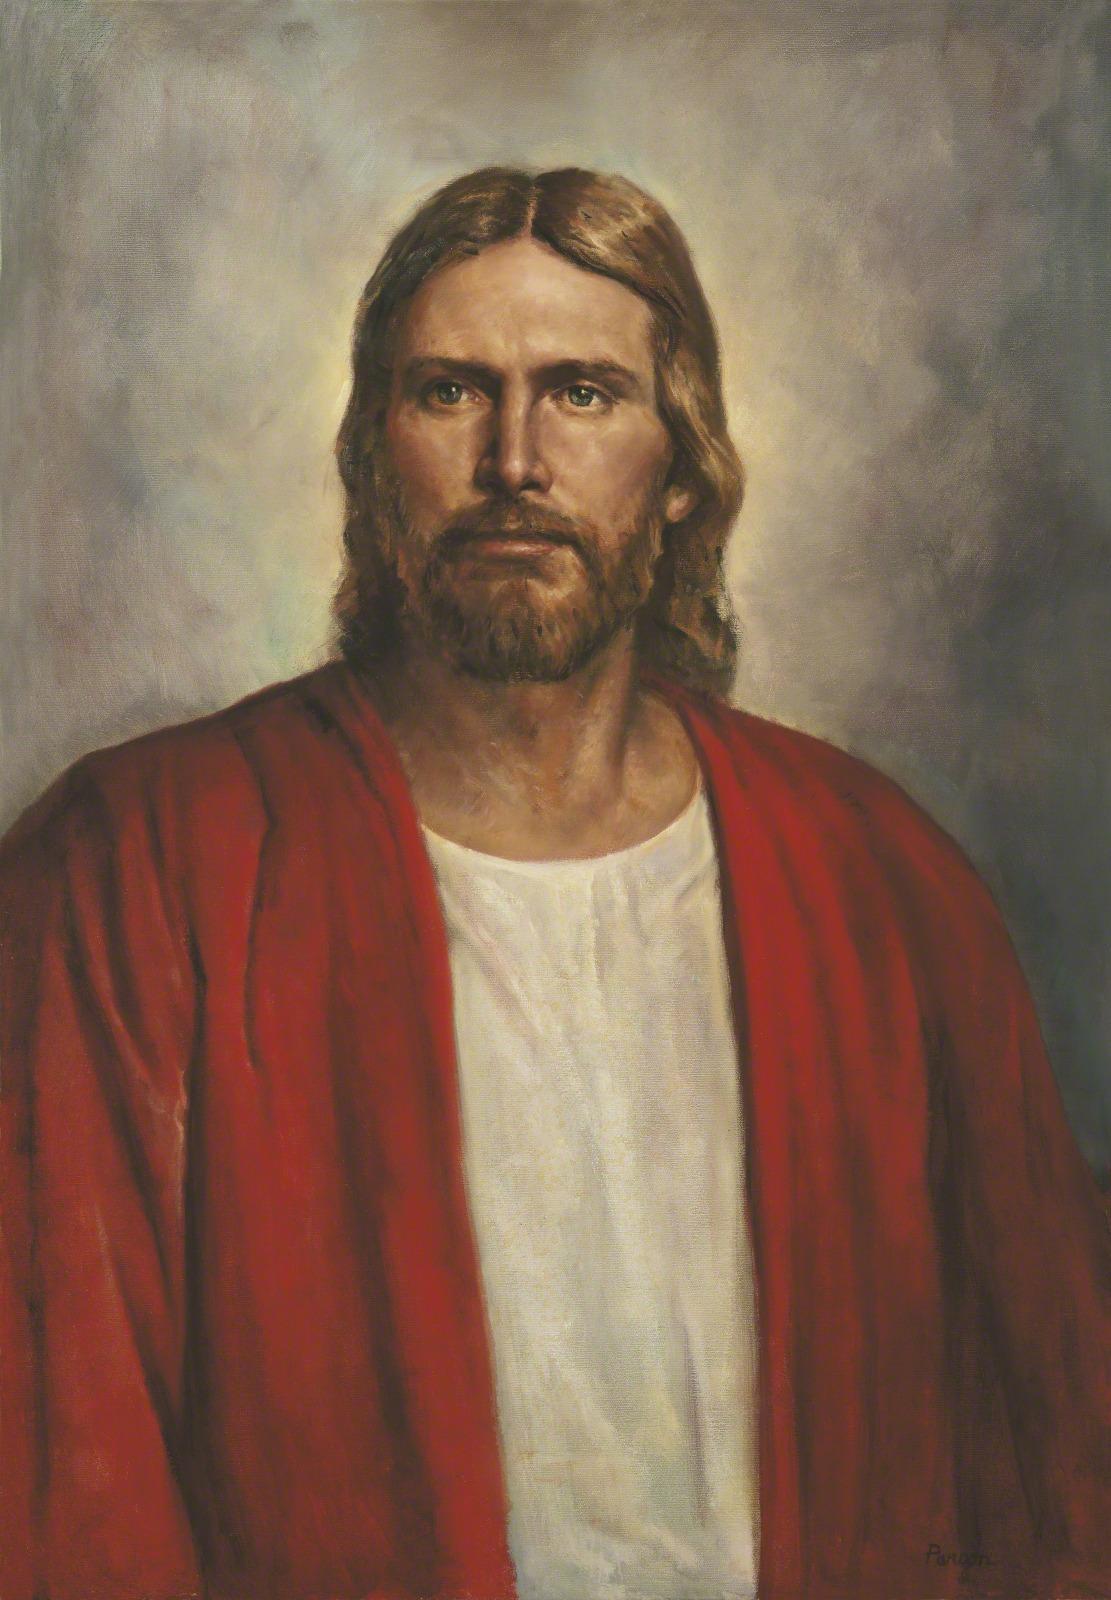 jesus-christ-39623-wallpaper.jpg?download=true